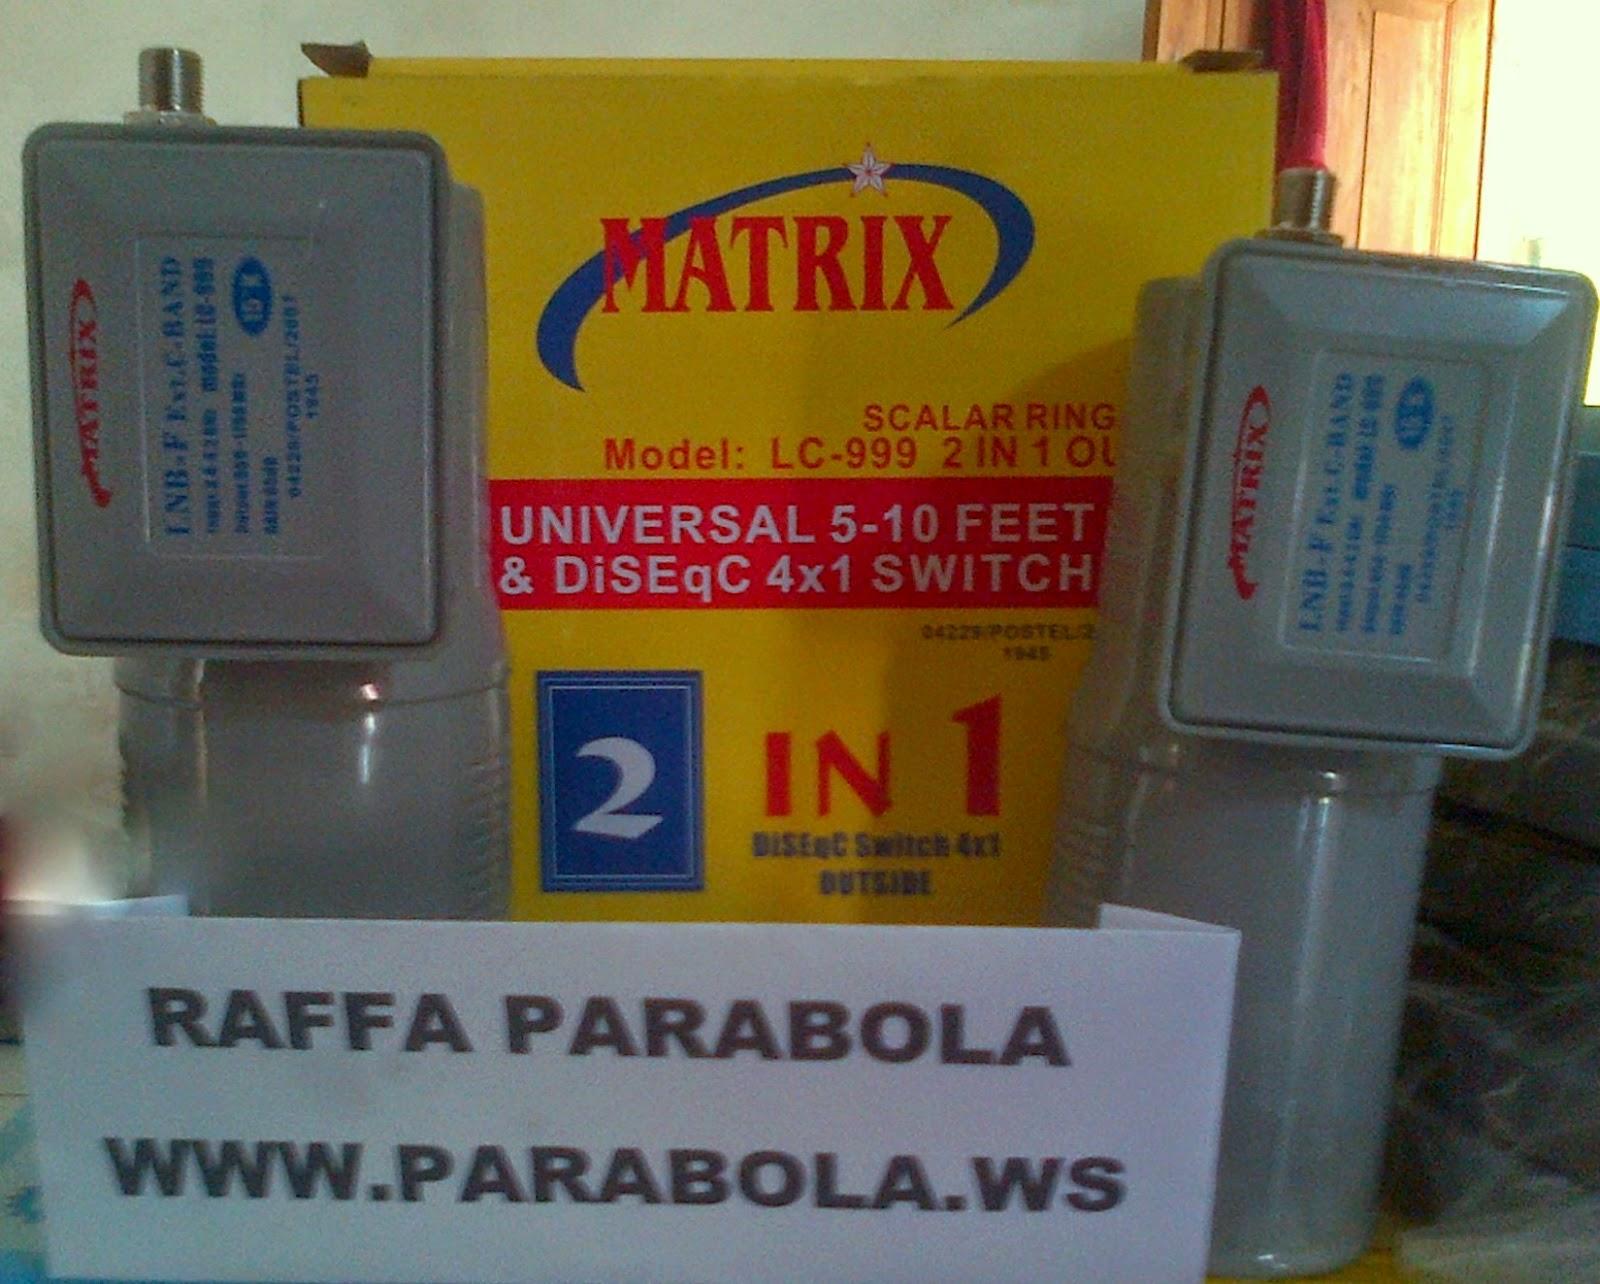 LNBF C Band Matrix 2 Satelit 1 Reciever parabola